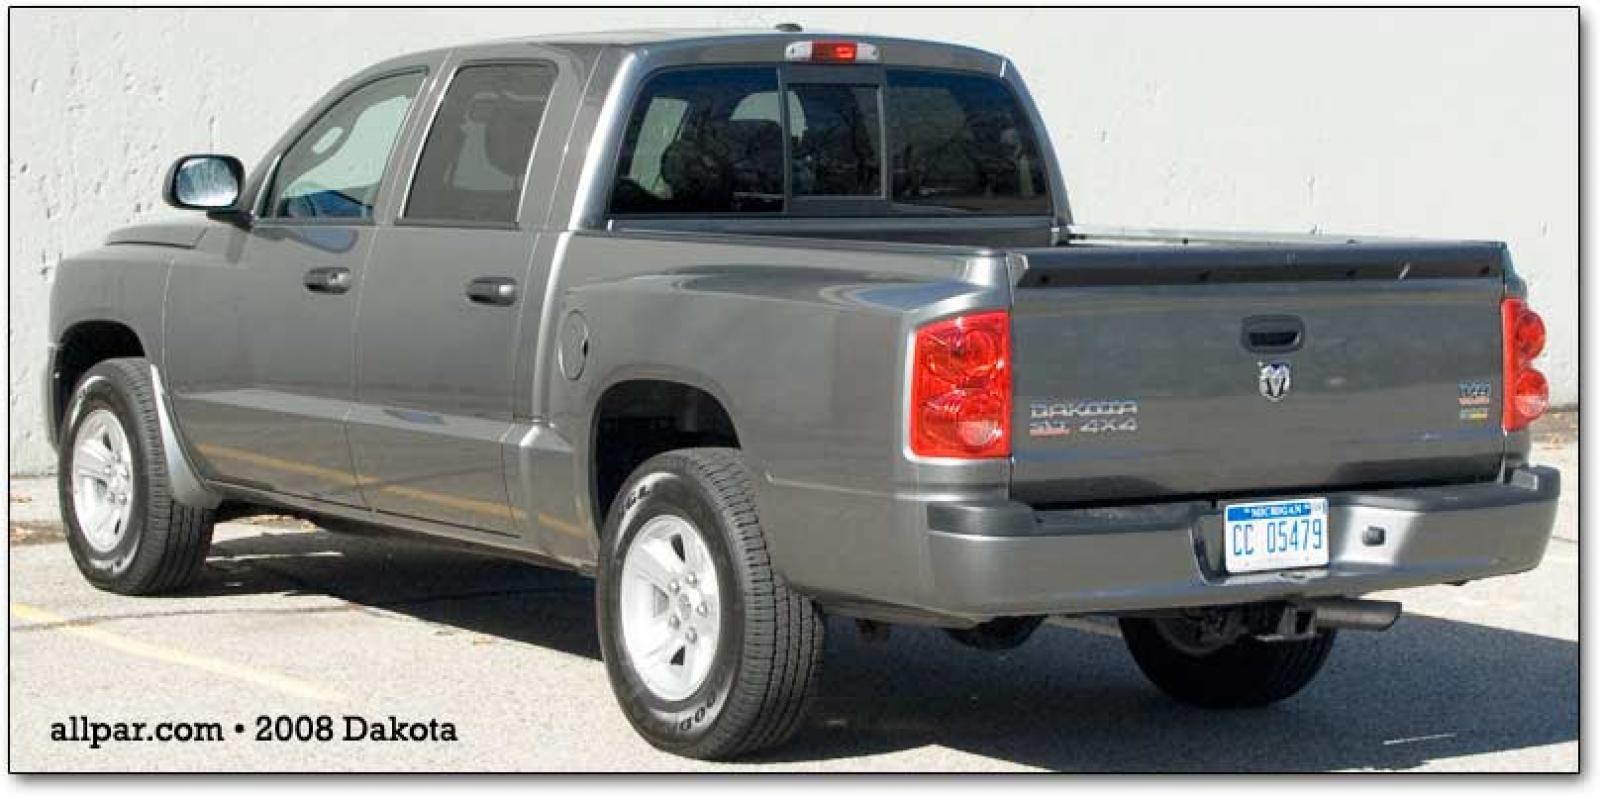 2006 Dodge Dakota #10 Dodge Dakota #10 800 1024 1280 1600 origin ...